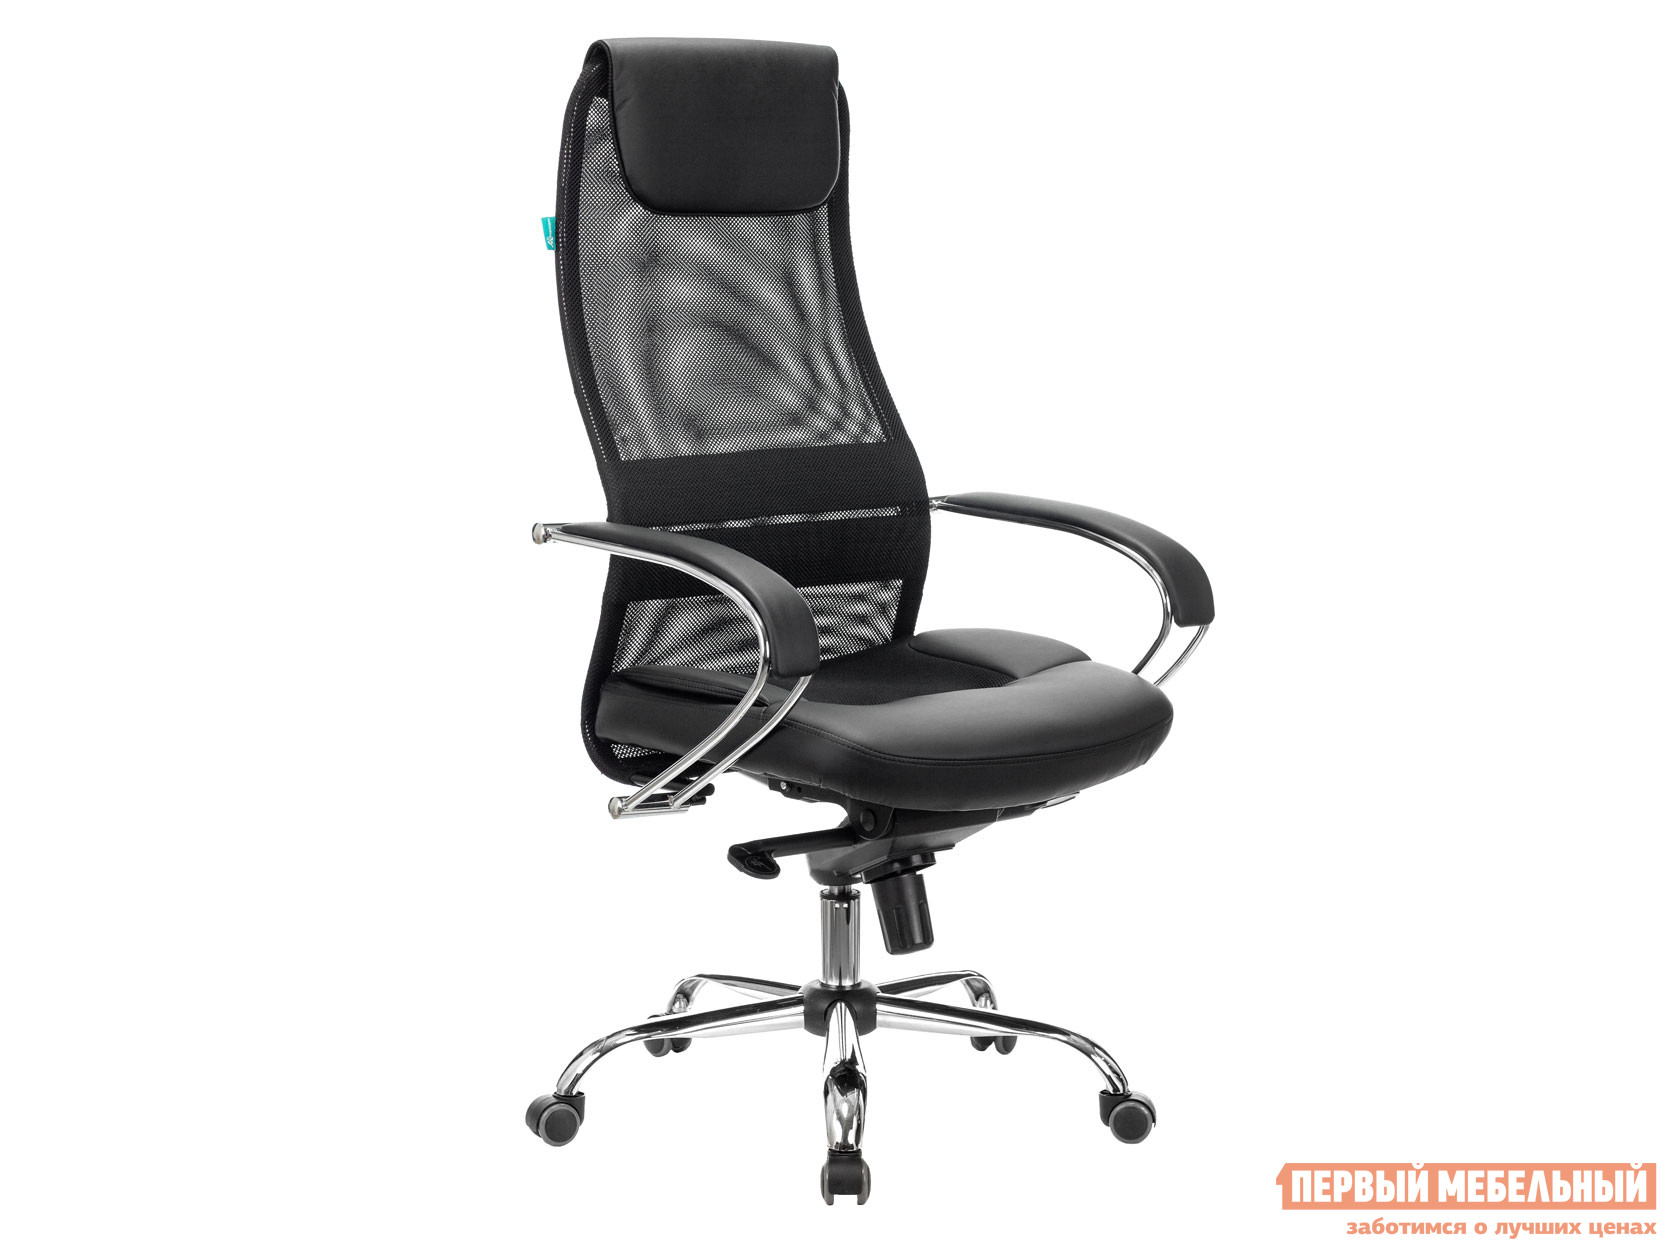 Кресло руководителя  CH-609SL TW-11 Черный / TW-01 Черный — CH-609SL TW-11 Черный / TW-01 Черный